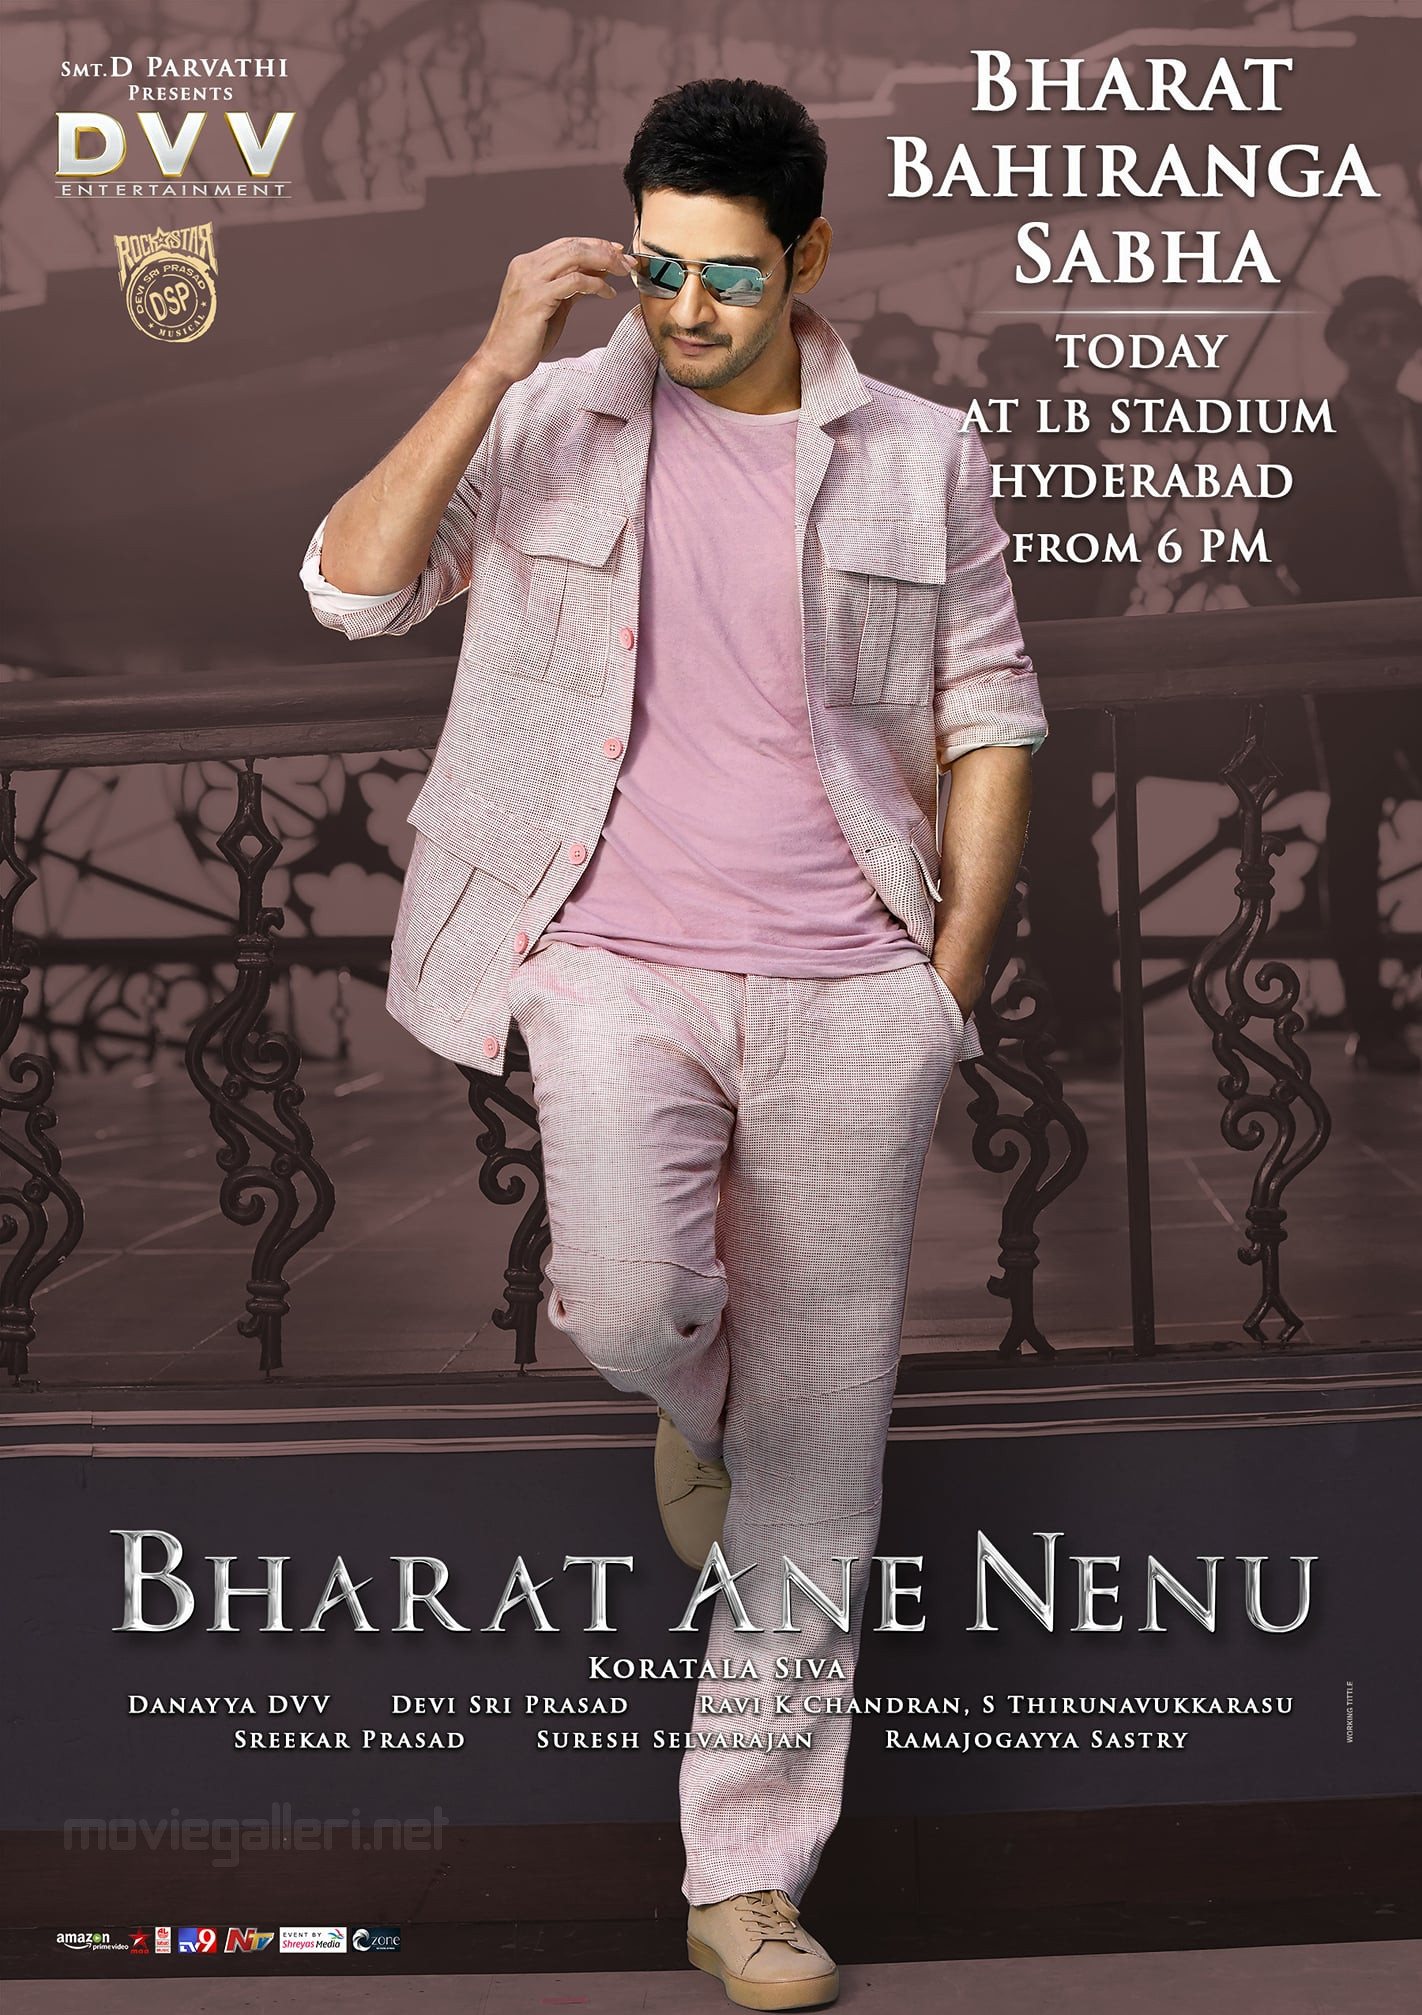 Mahesh Babu bharath Ane Nenu Movie Bharat Bahiranga Sabha Today Poster HD